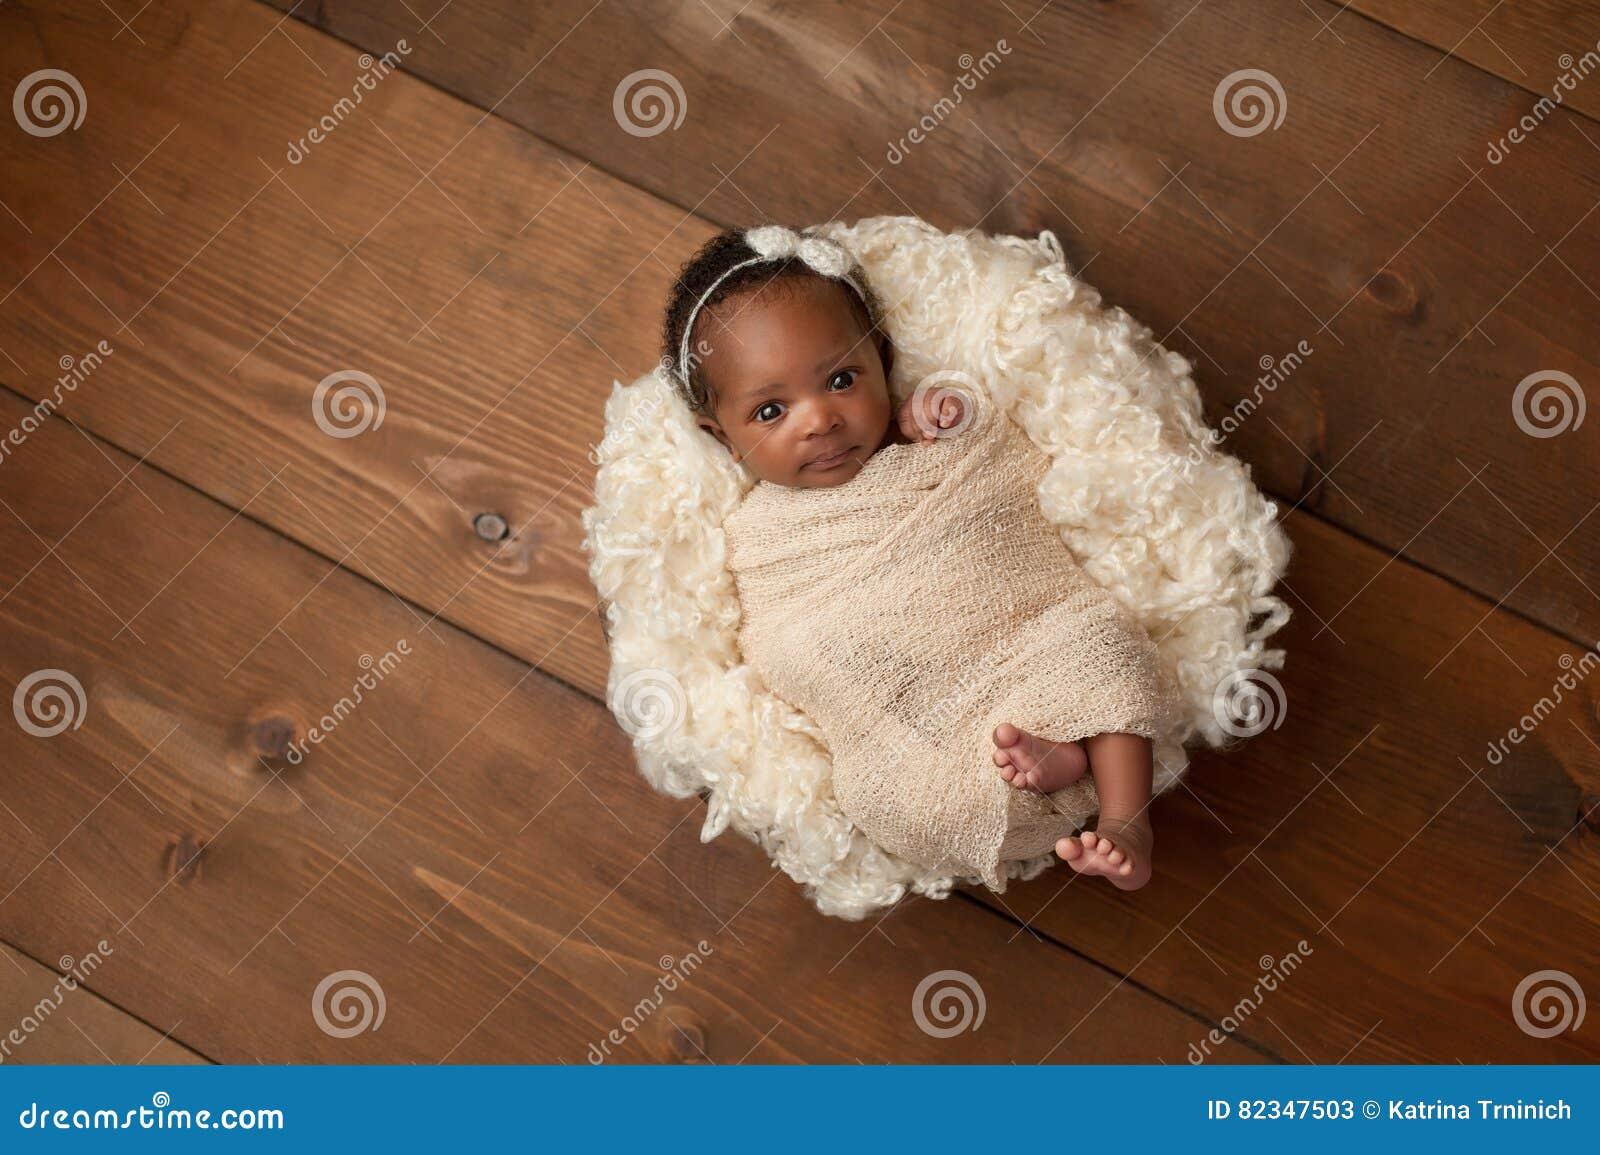 Swaddled Newborn Baby Girl